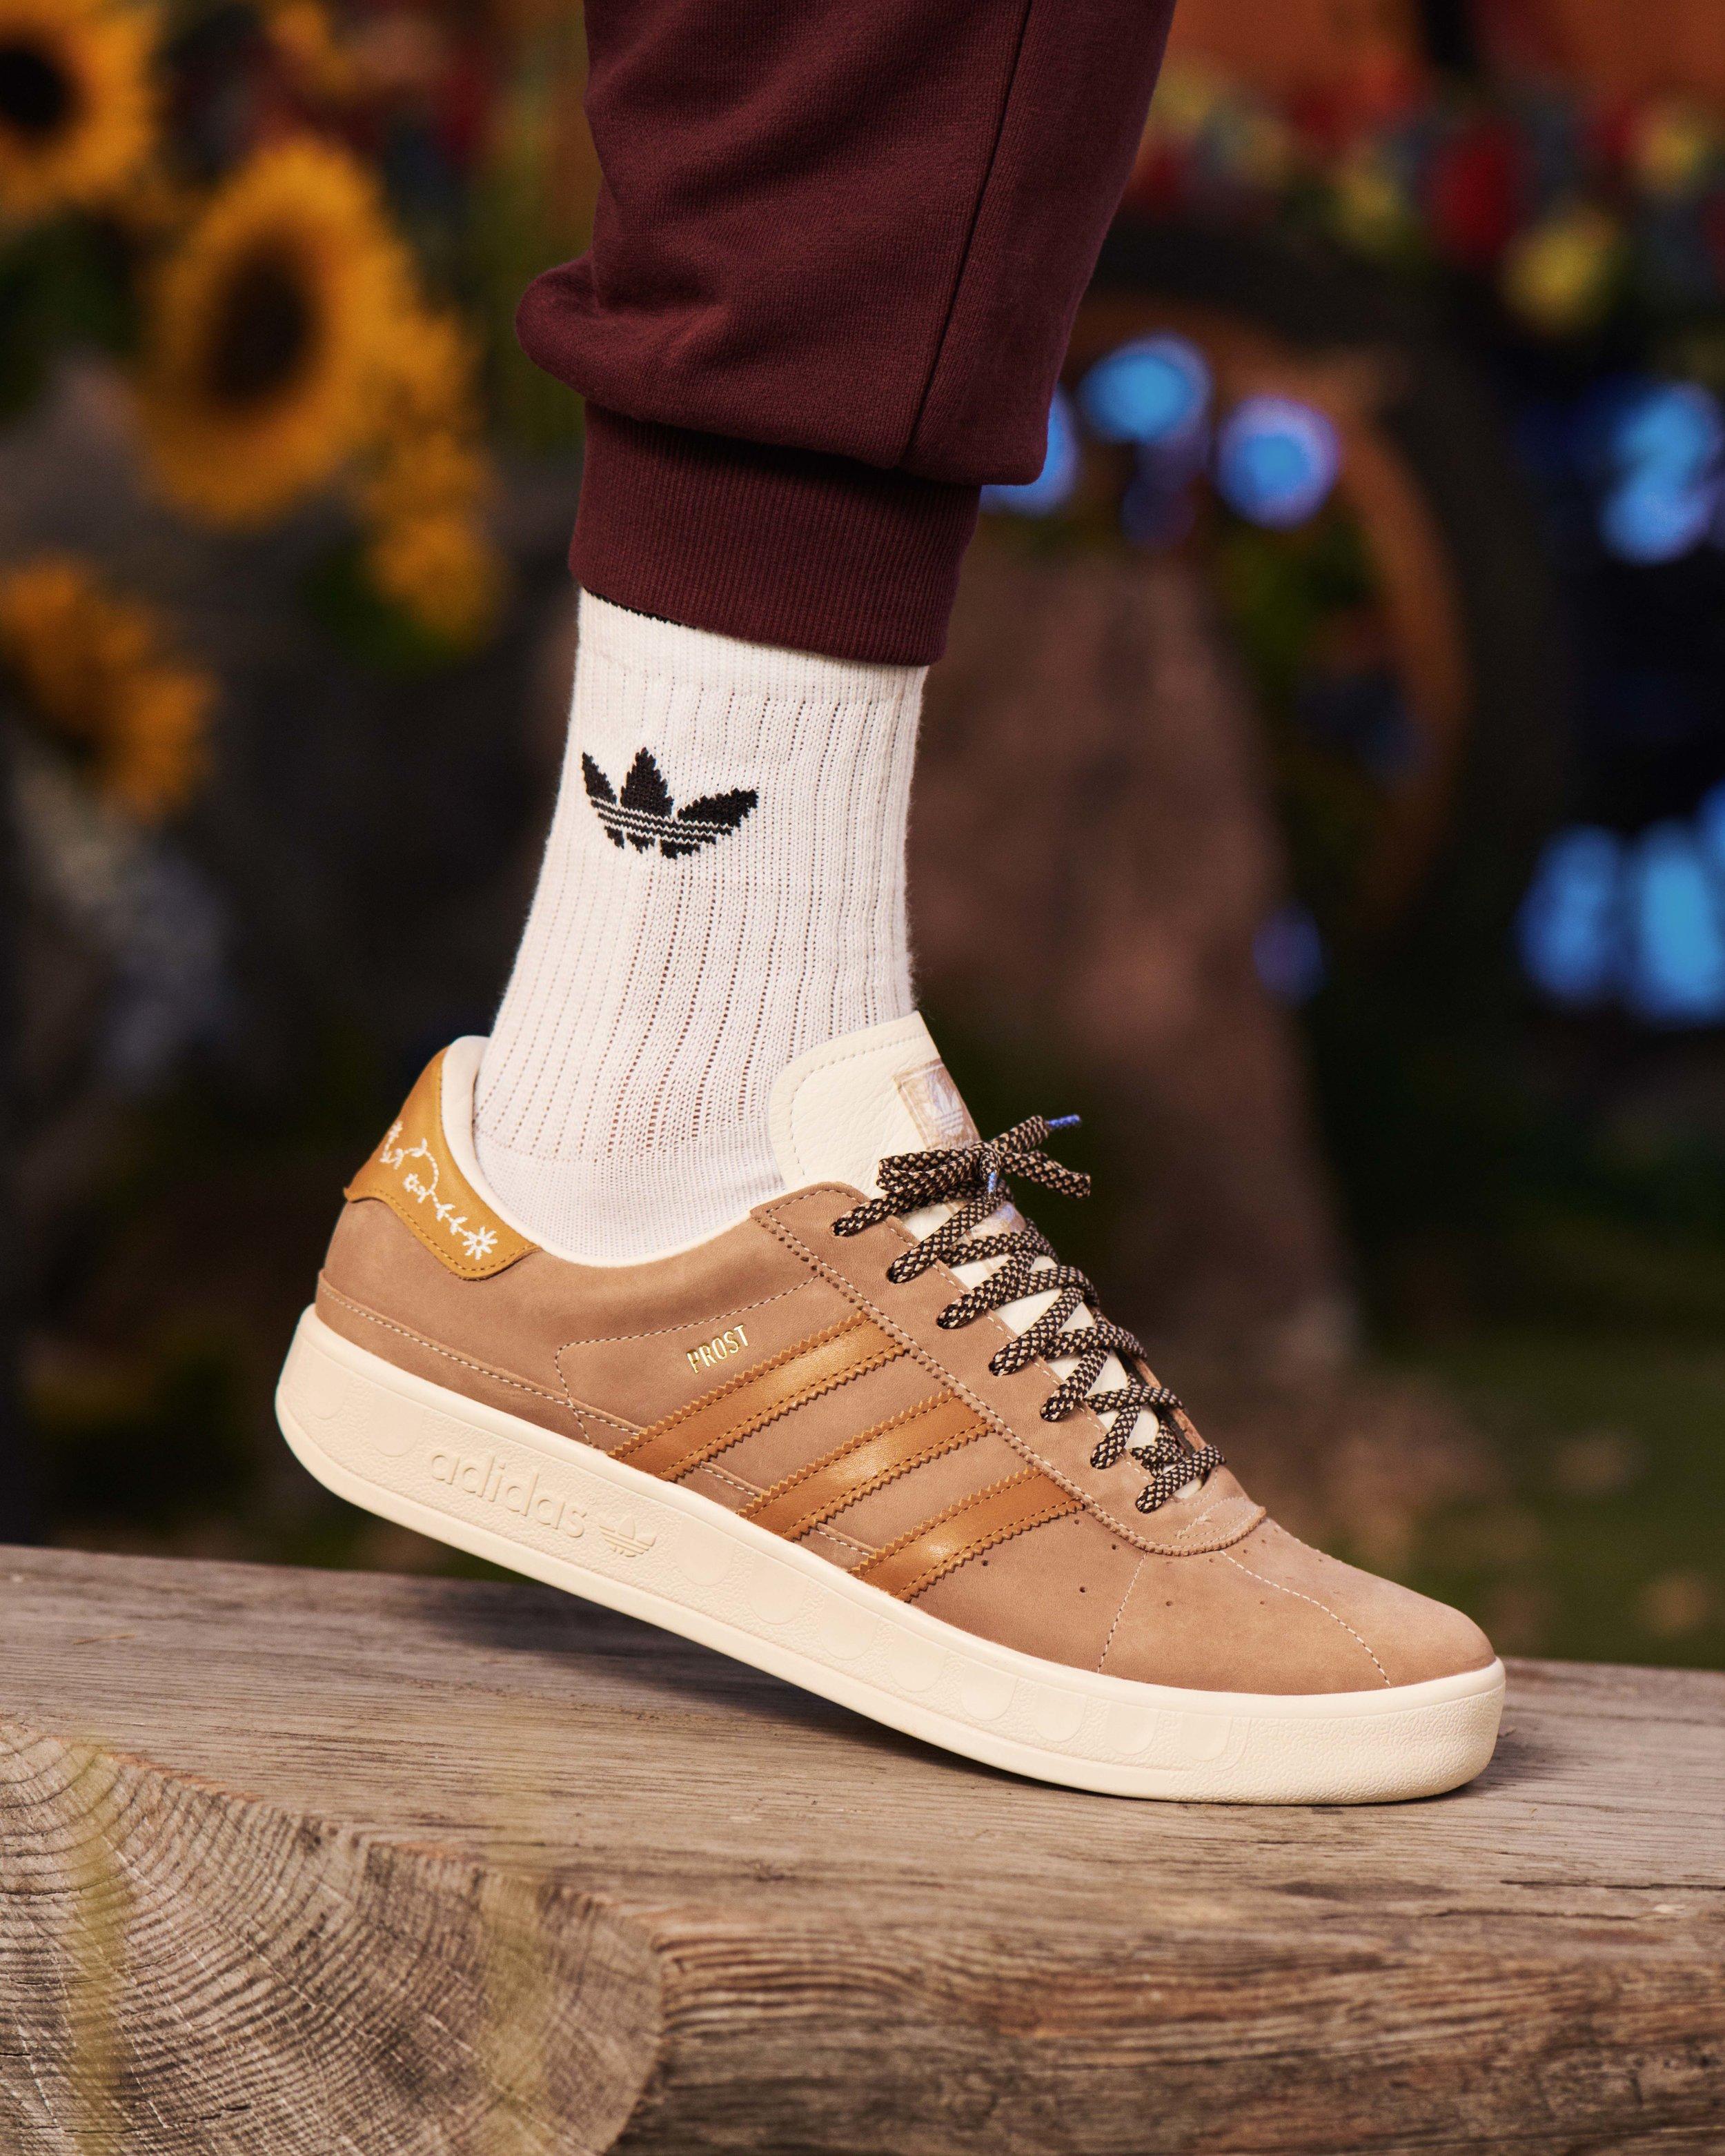 Adidas_MIG_Beige-2.jpg